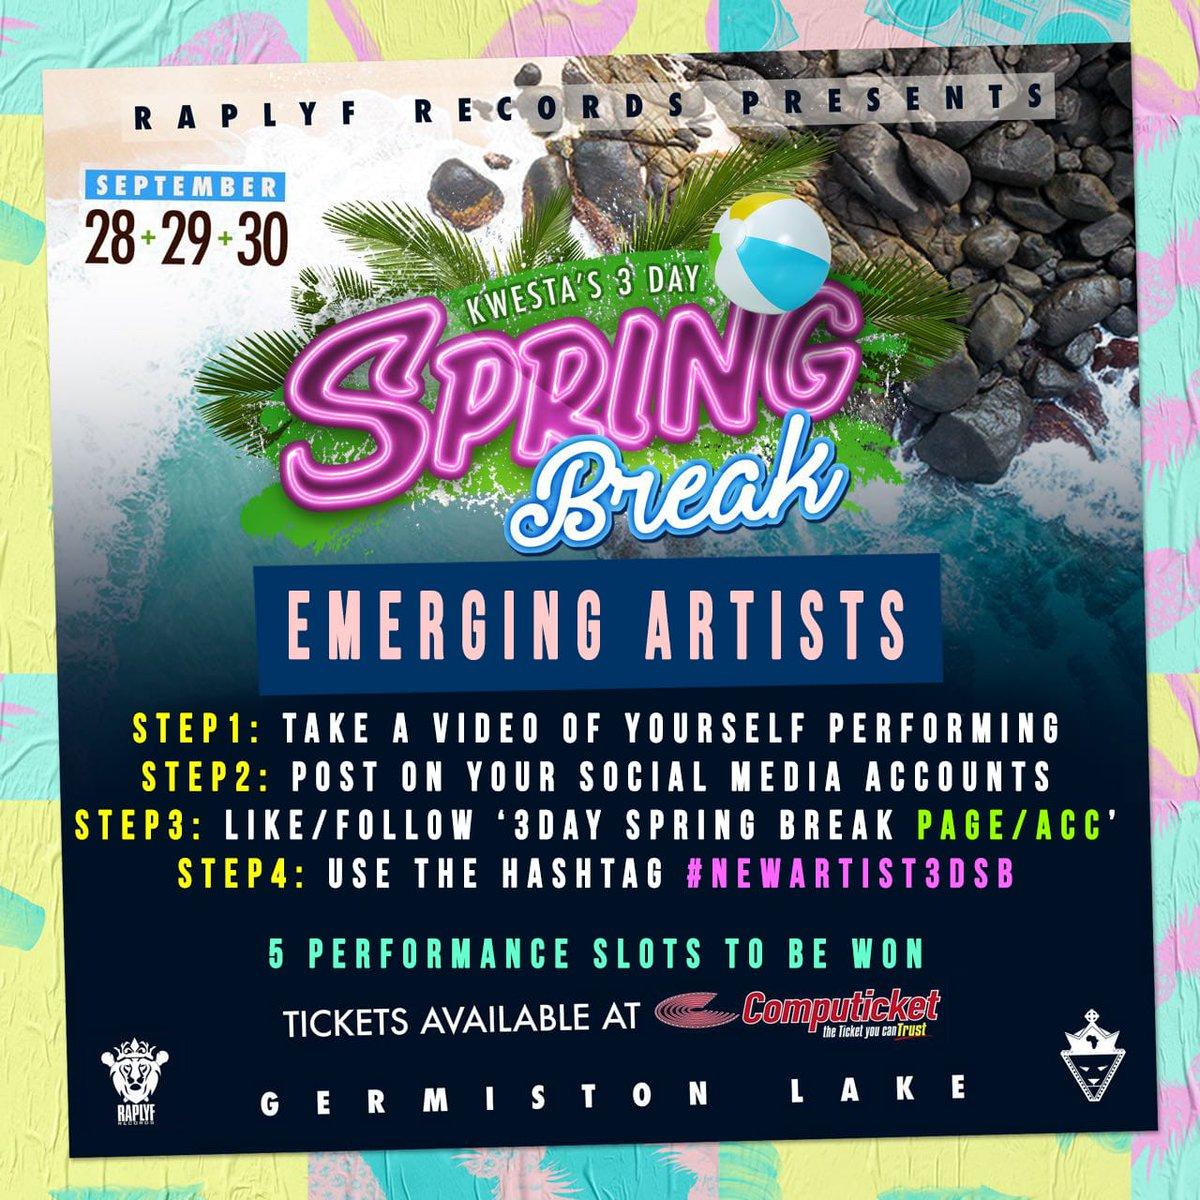 Top 20 artists revealed for Kwesta's 3 Day Spring Break